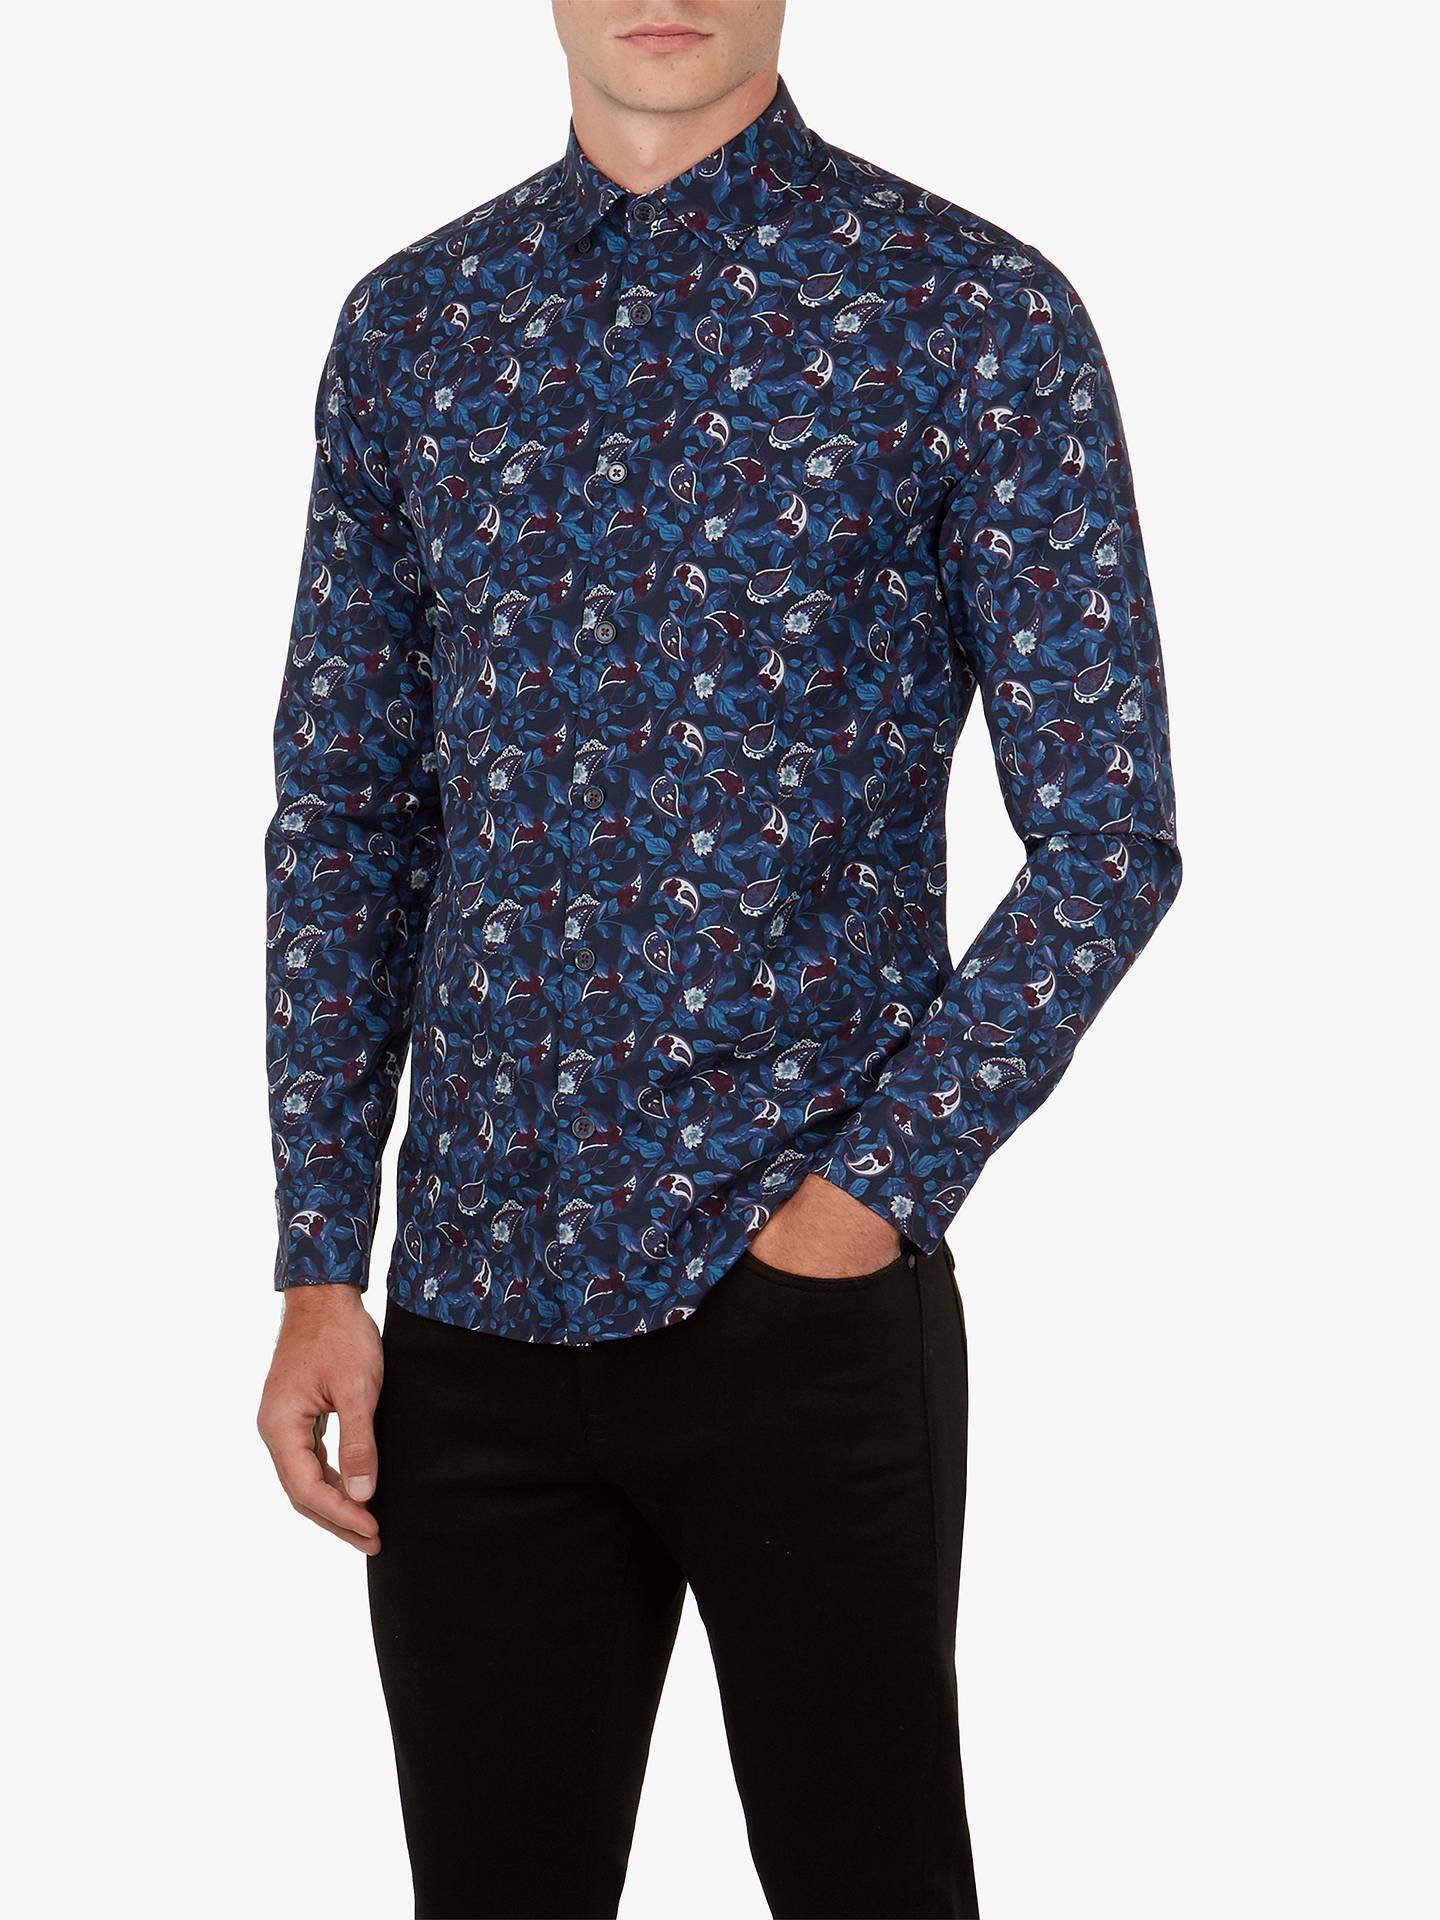 db952cdee3aa Ted Baker Jonpay Long Sleeve Printed Shirt at John Lewis   Partners